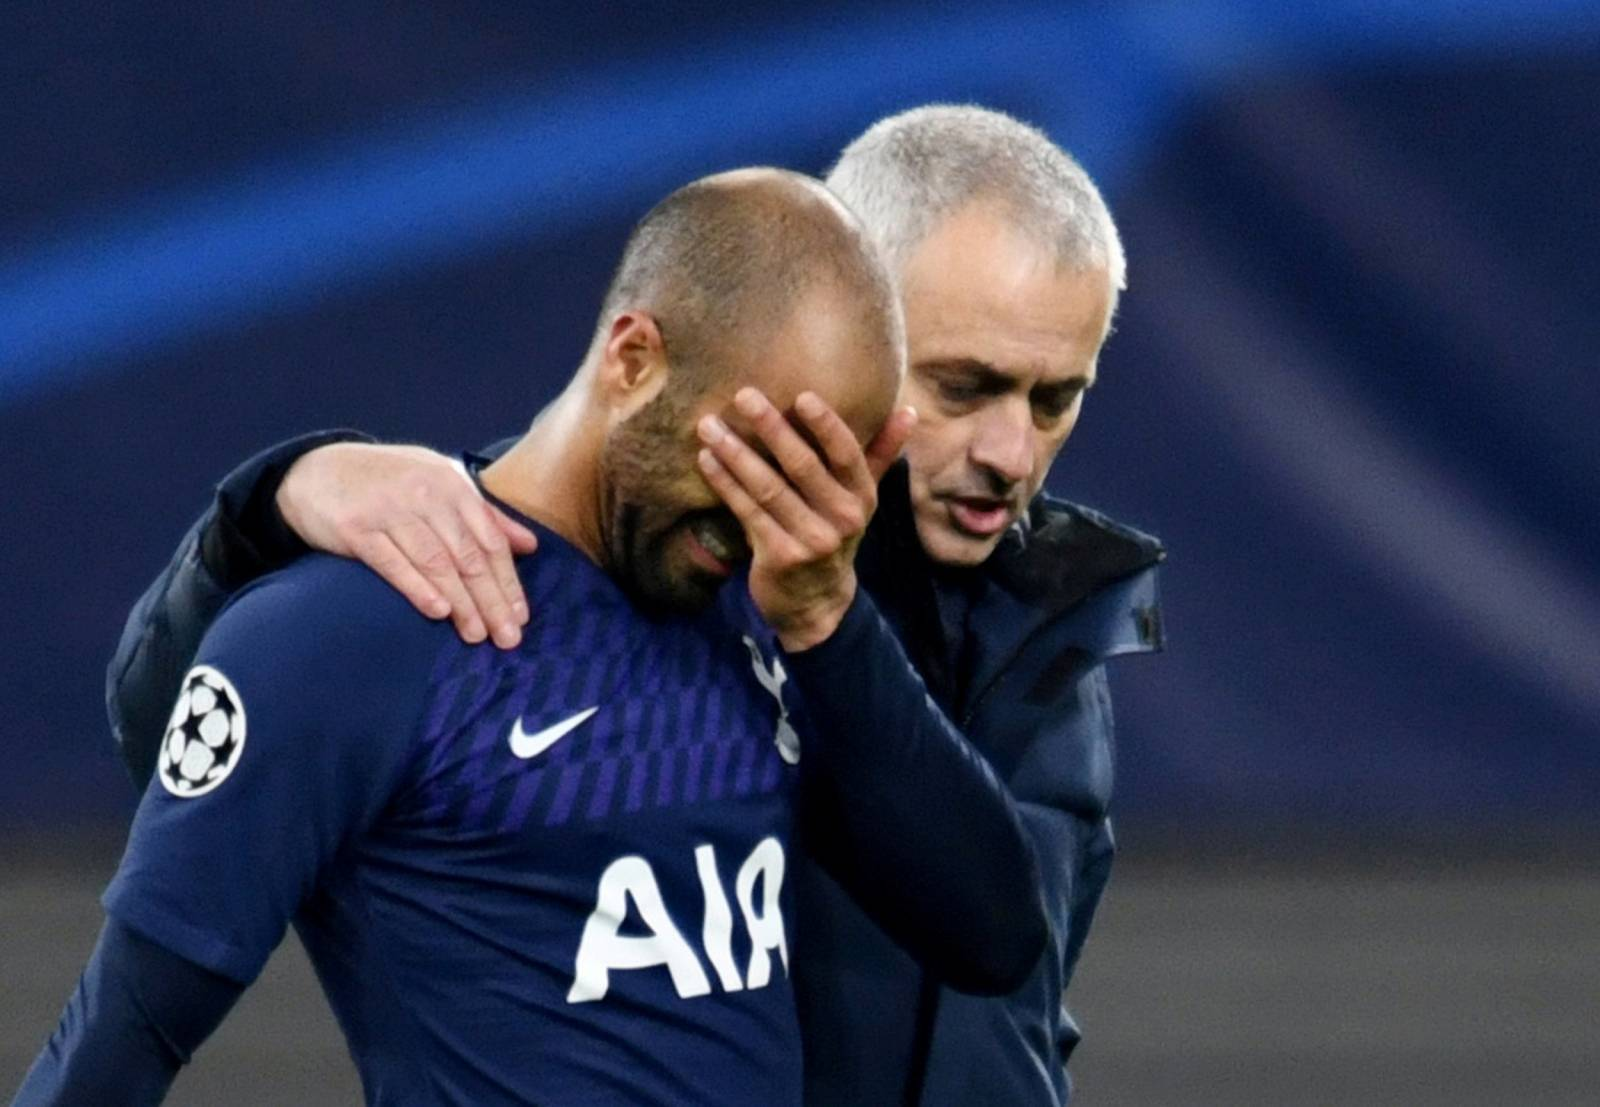 Champions League - Round of 16 Second Leg - RB Leipzig v Tottenham Hotspur